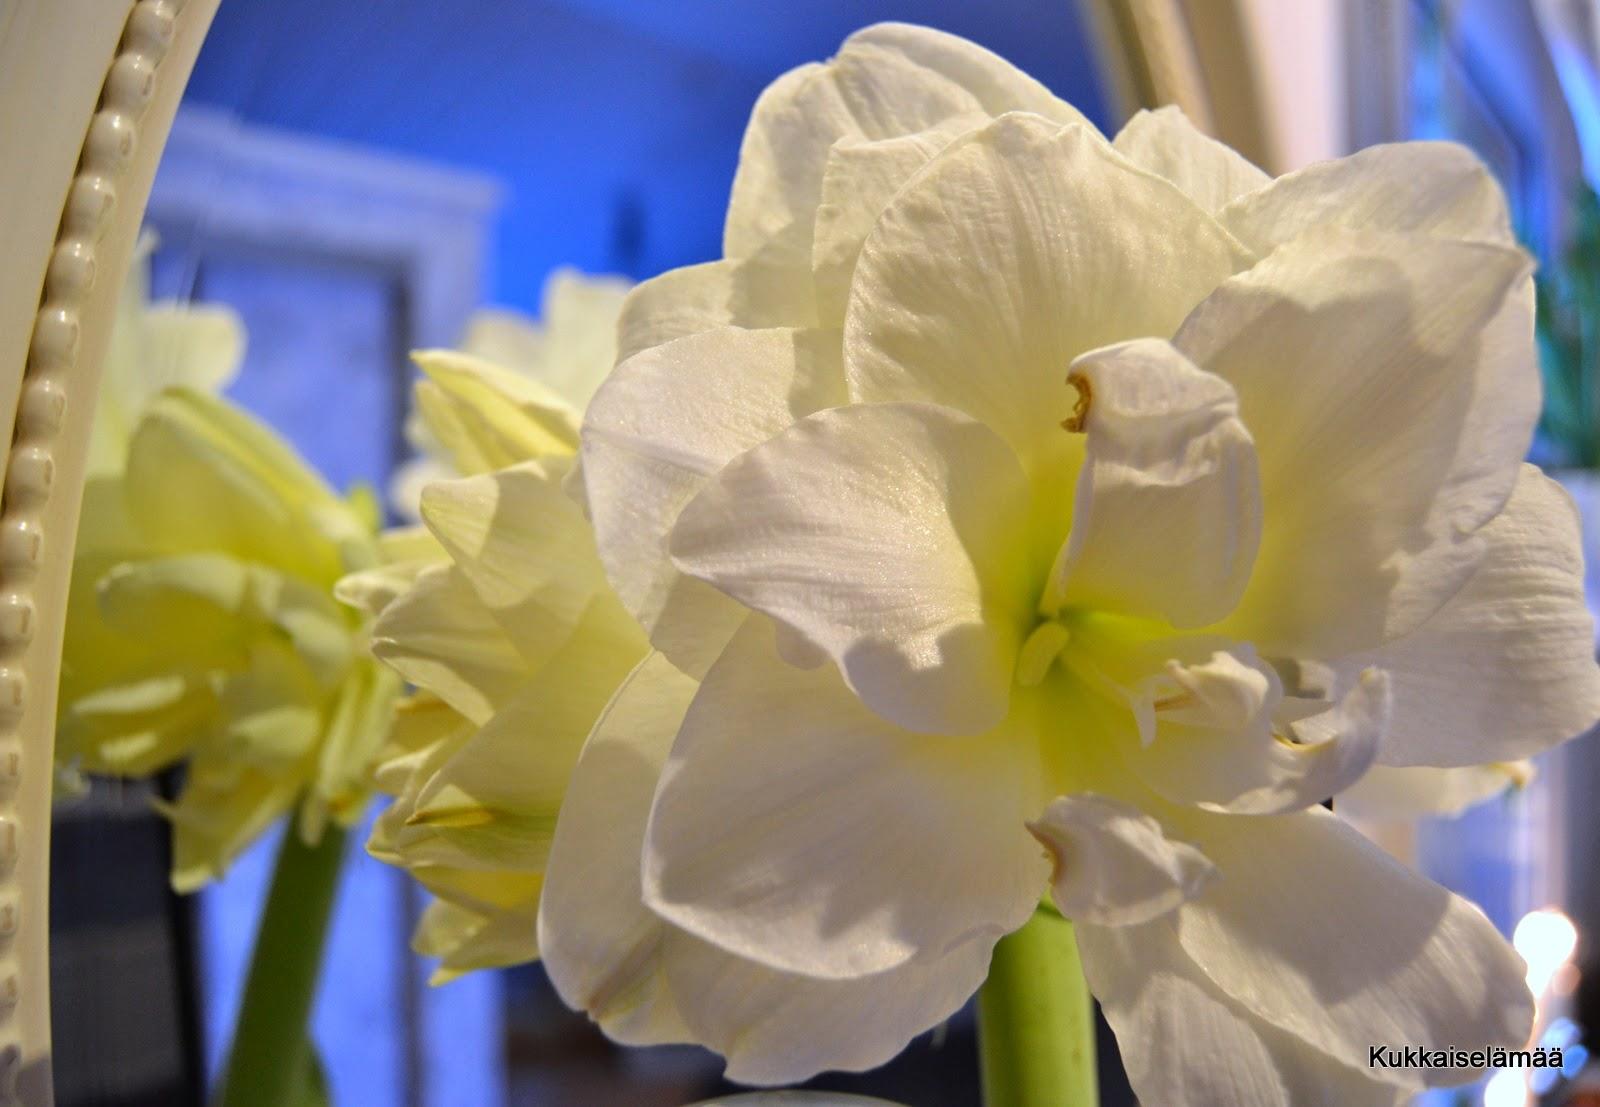 Voiko ihanampaa olla? – The most beautiful flower